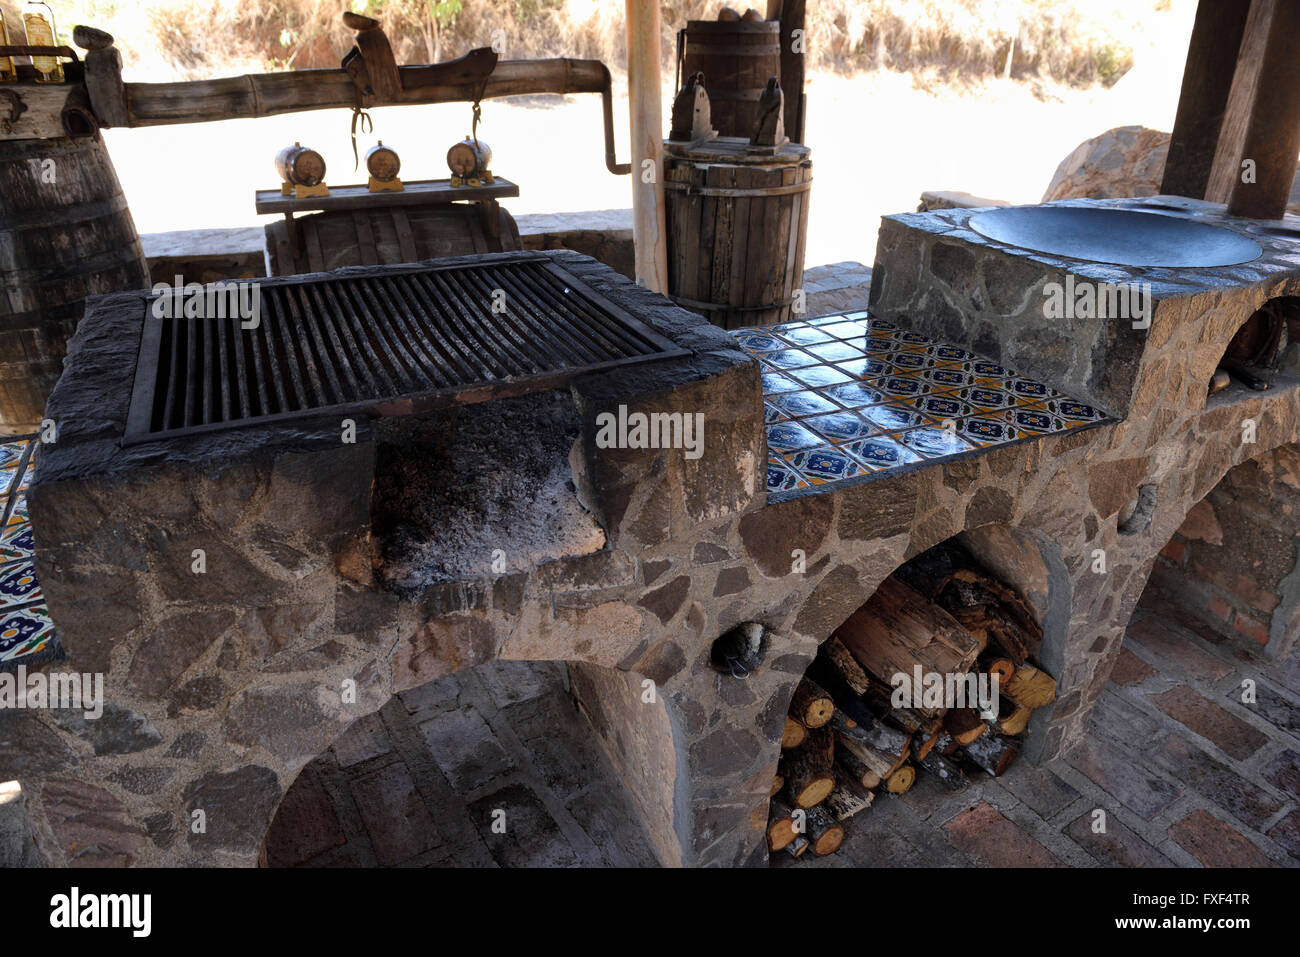 Outdoorküche Gas Turbine : Producing steel stockfotos & producing steel bilder alamy